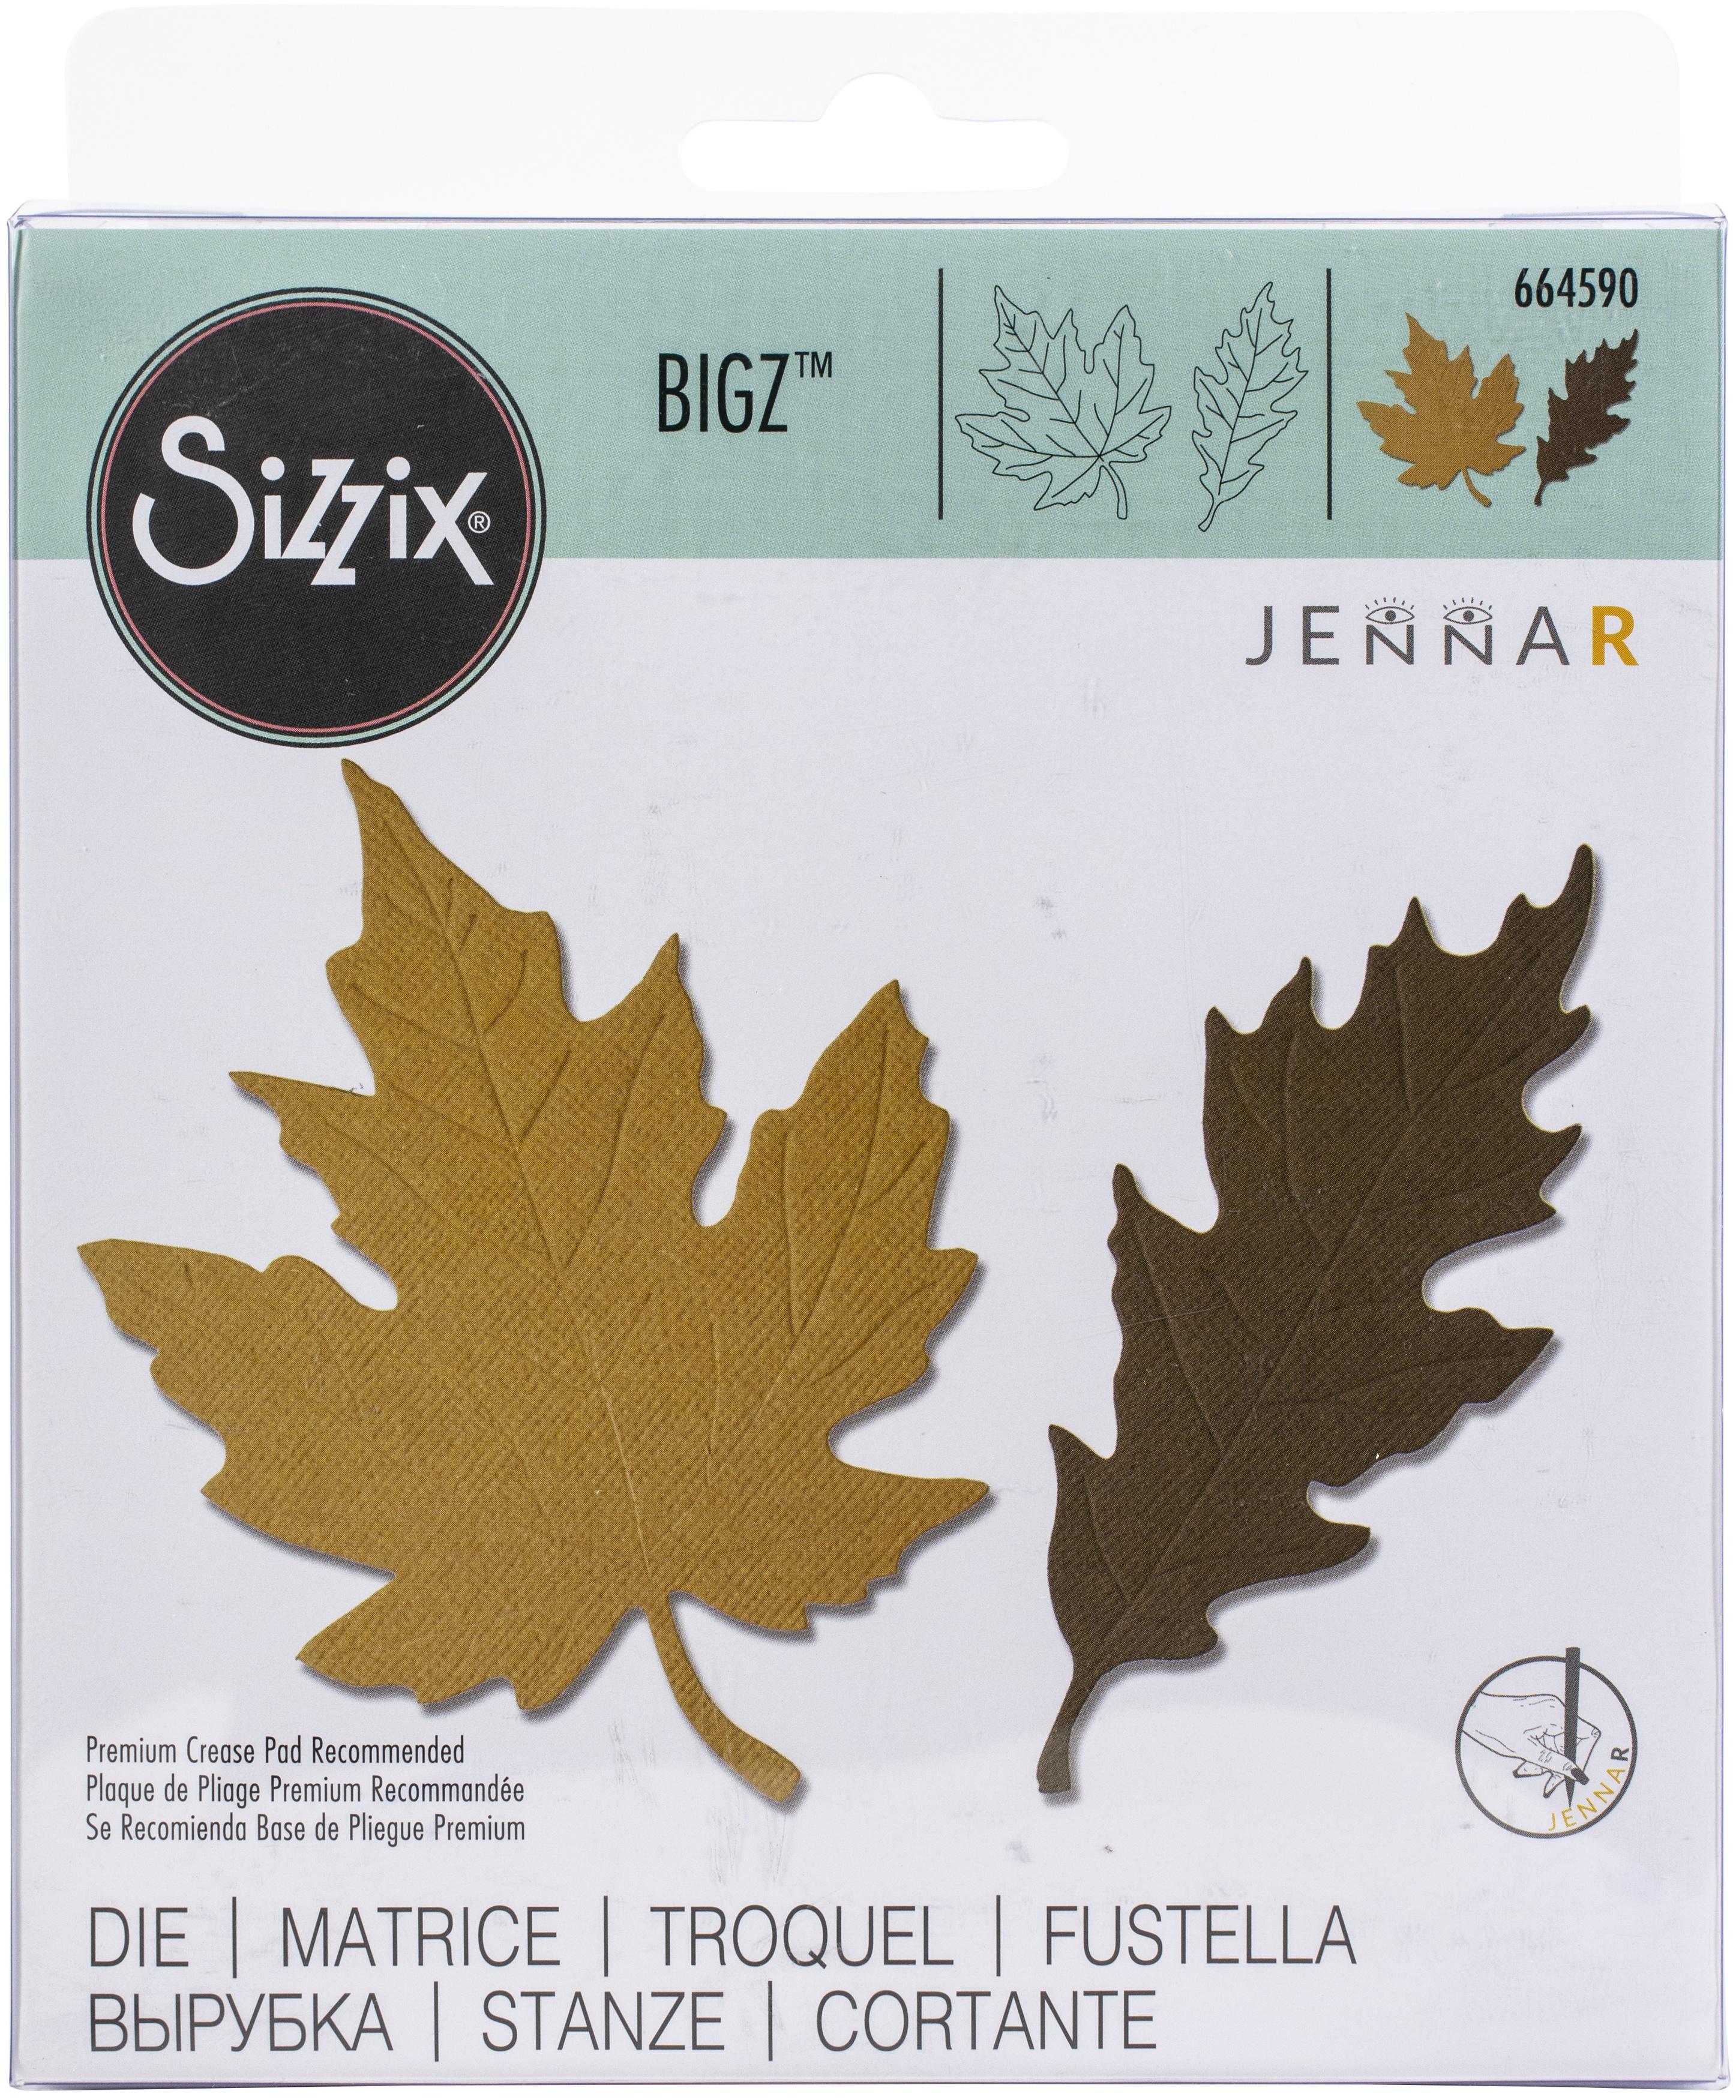 Sizzix Bigz Die By Jenna Rushforth-Autumnal Leaves